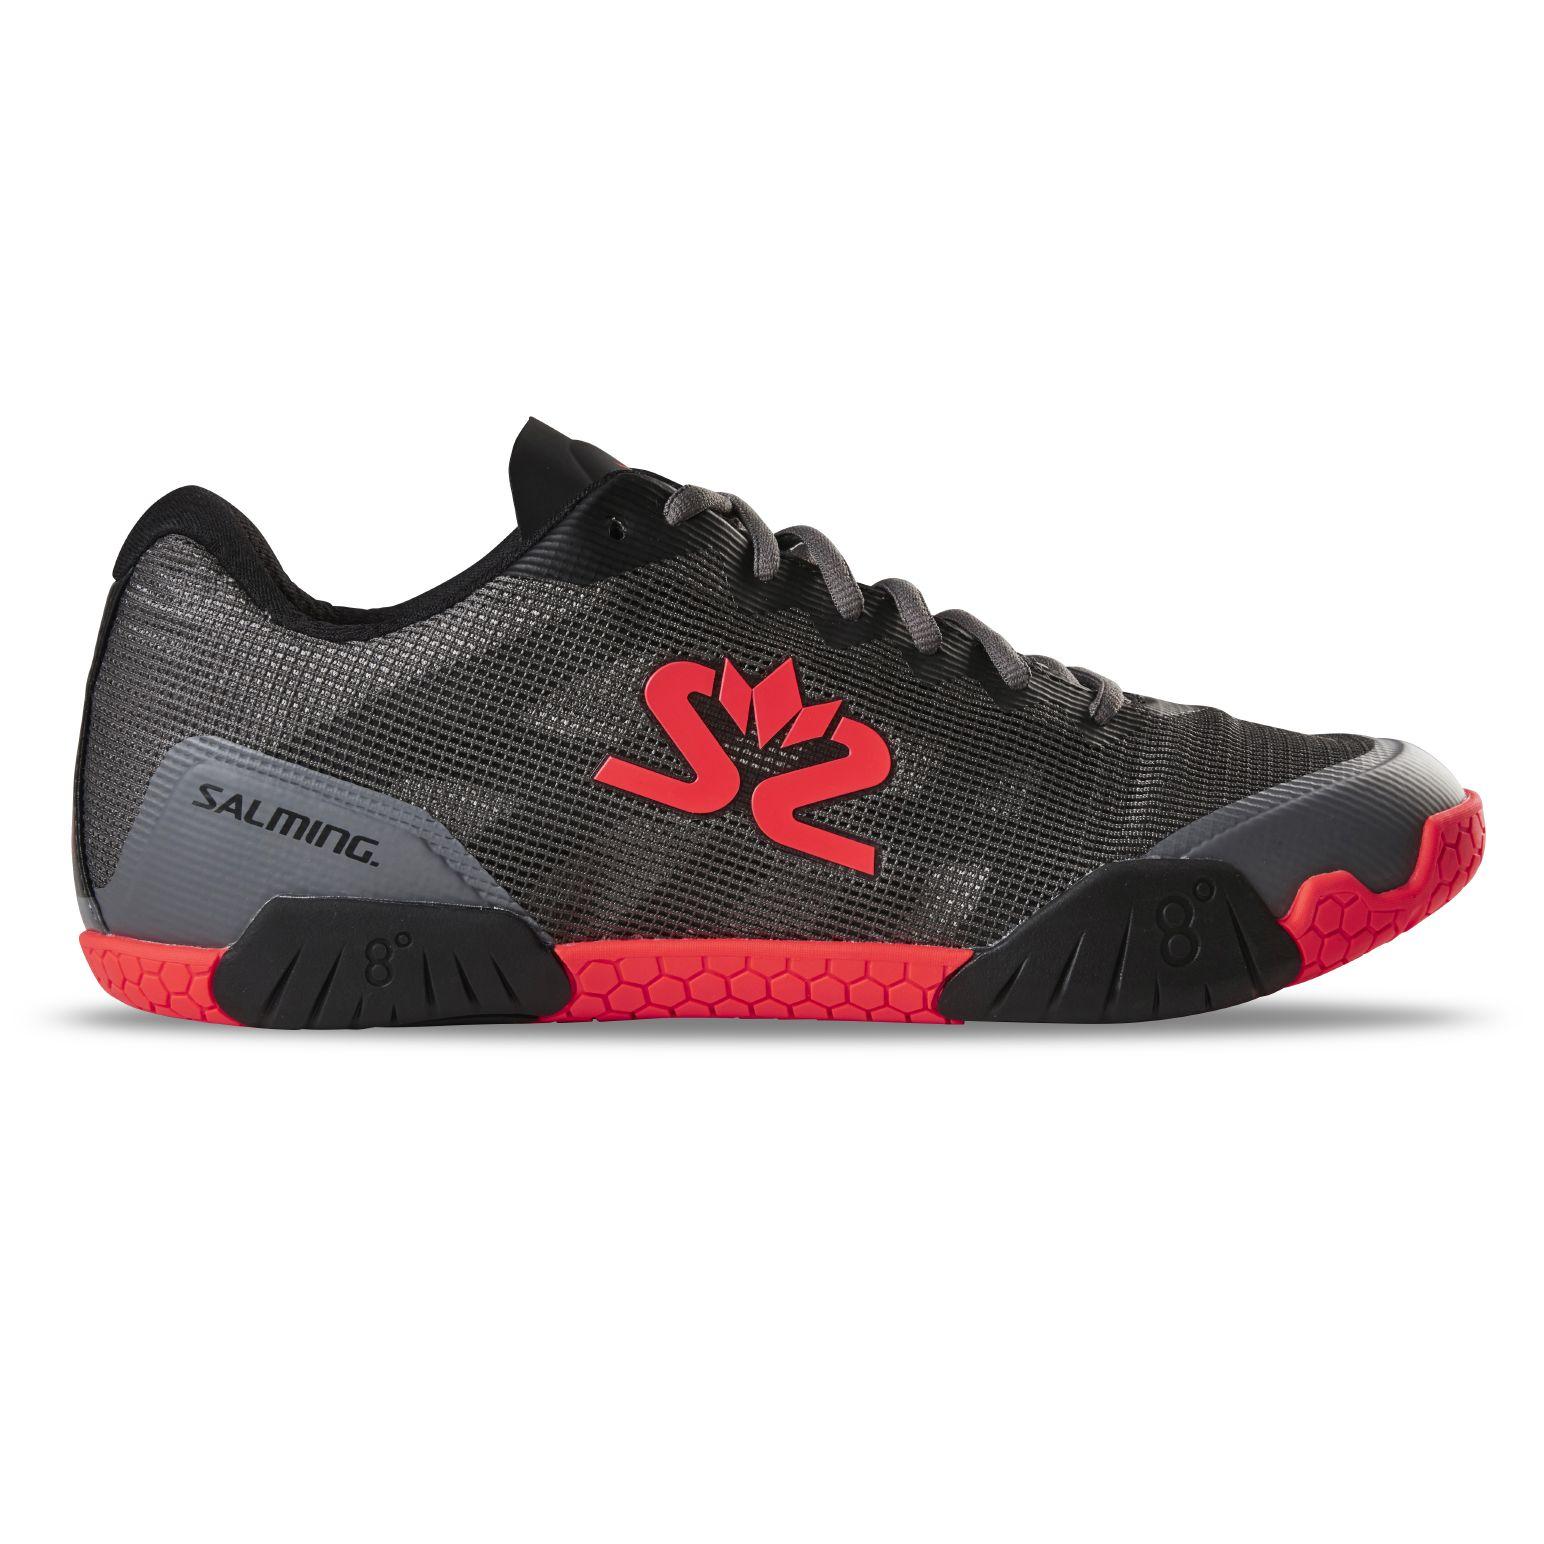 Salming Hawk Shoe Men GunMetal/Red 8,5 UK - 43 1/3 EUR - 27,5 cm